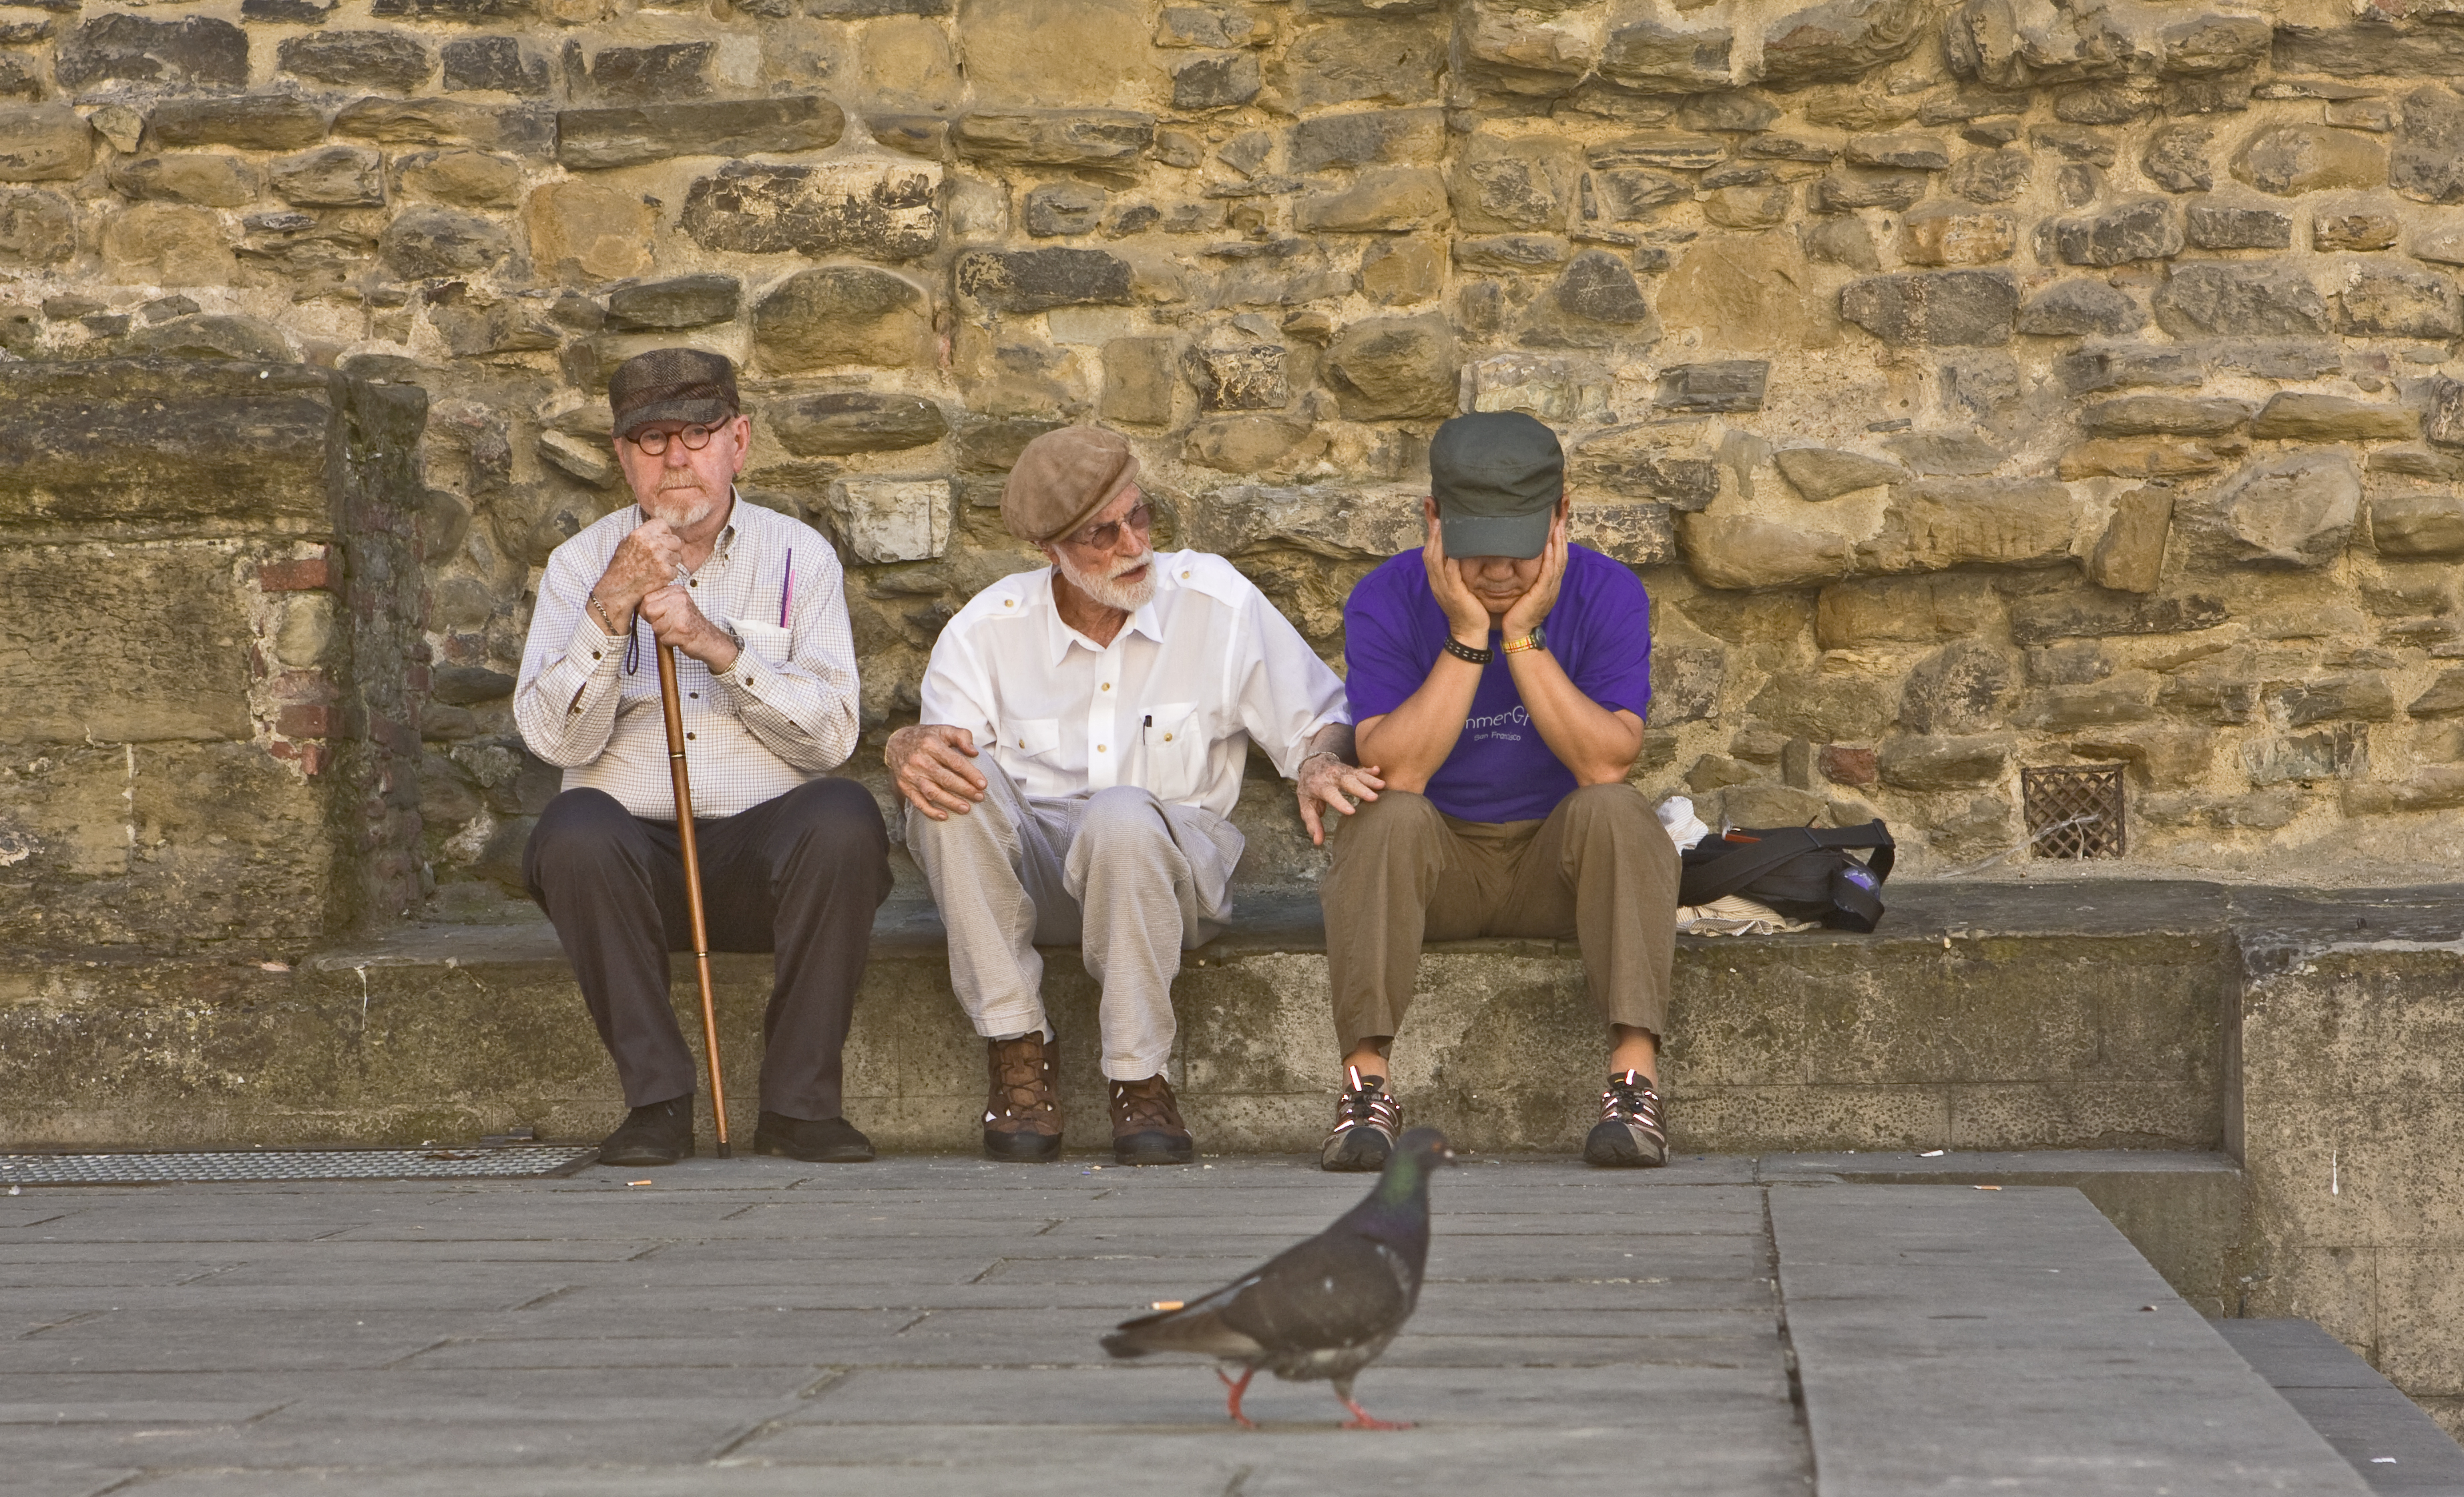 psd with pigeon IMG_5645.jpg